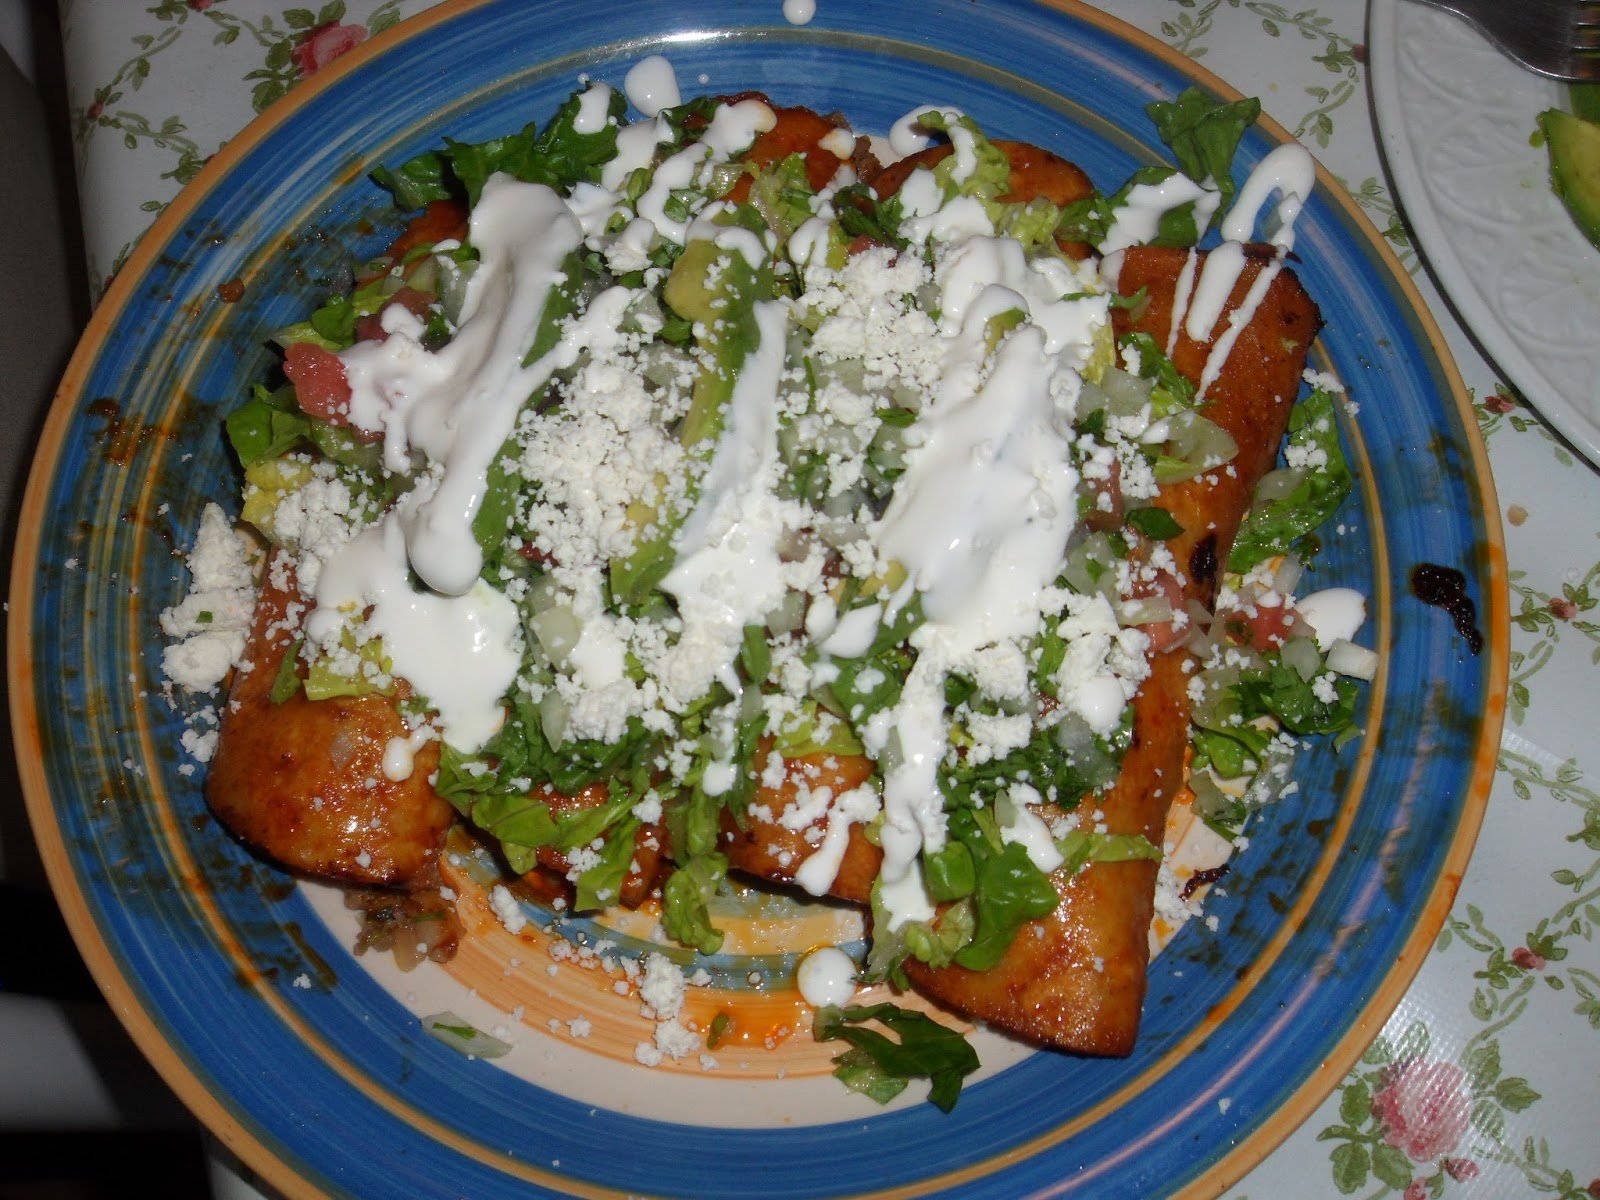 La Cocina De Nathan: Cuban, Spanish, Mexican Cooking & More